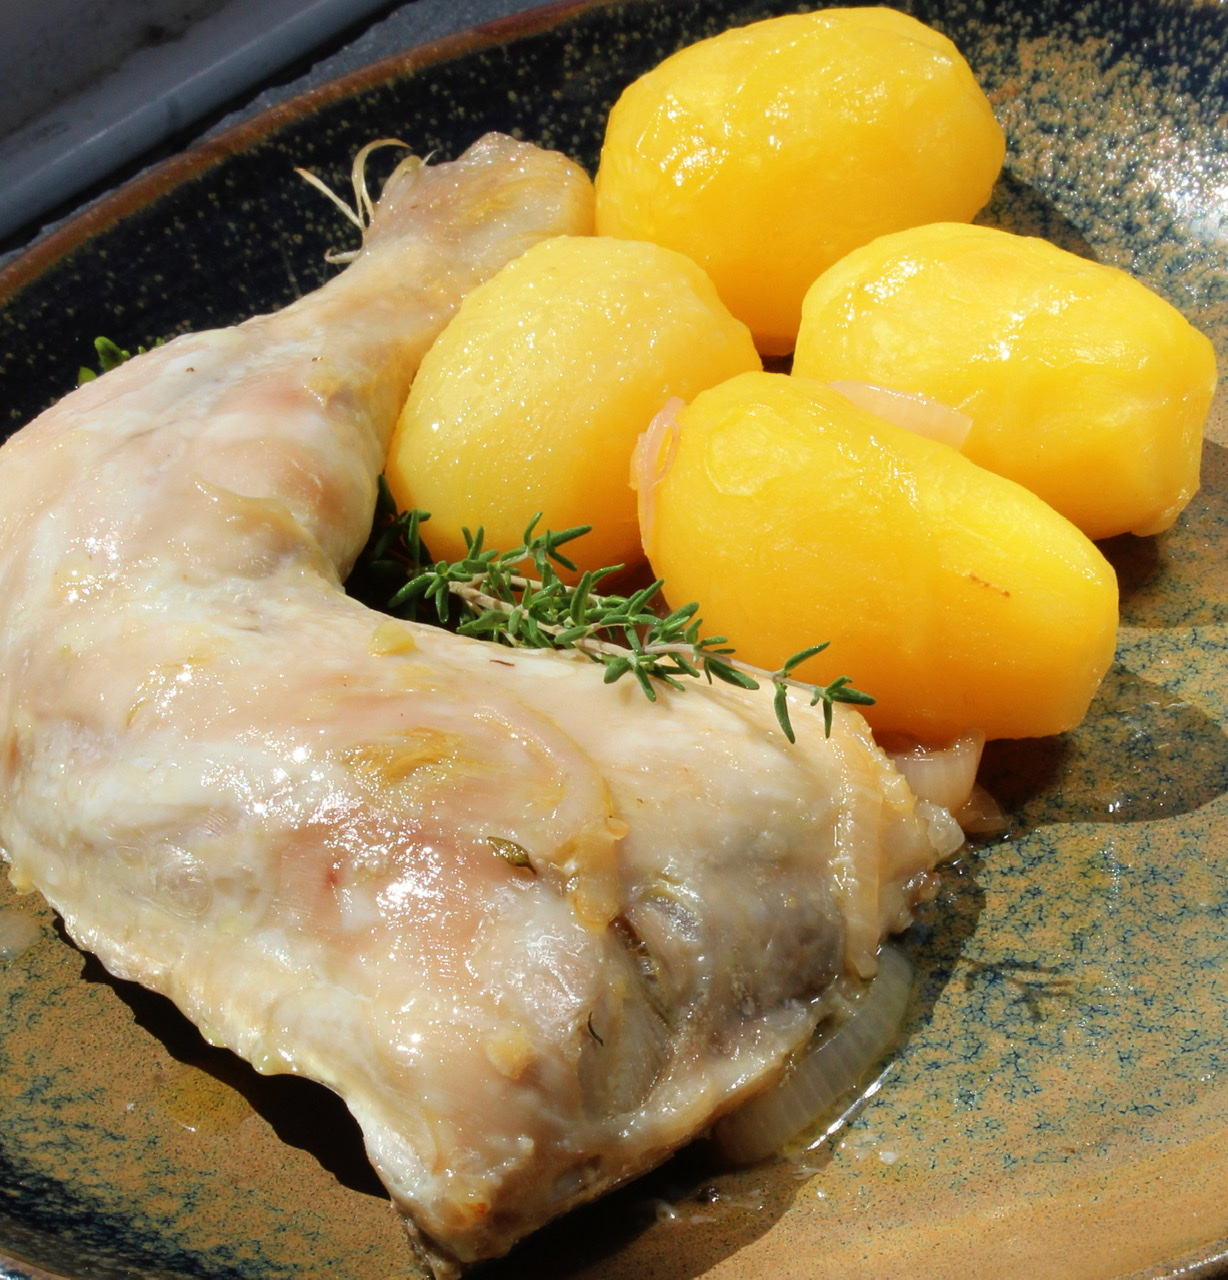 Italian Chicken with Garlic and Lemon